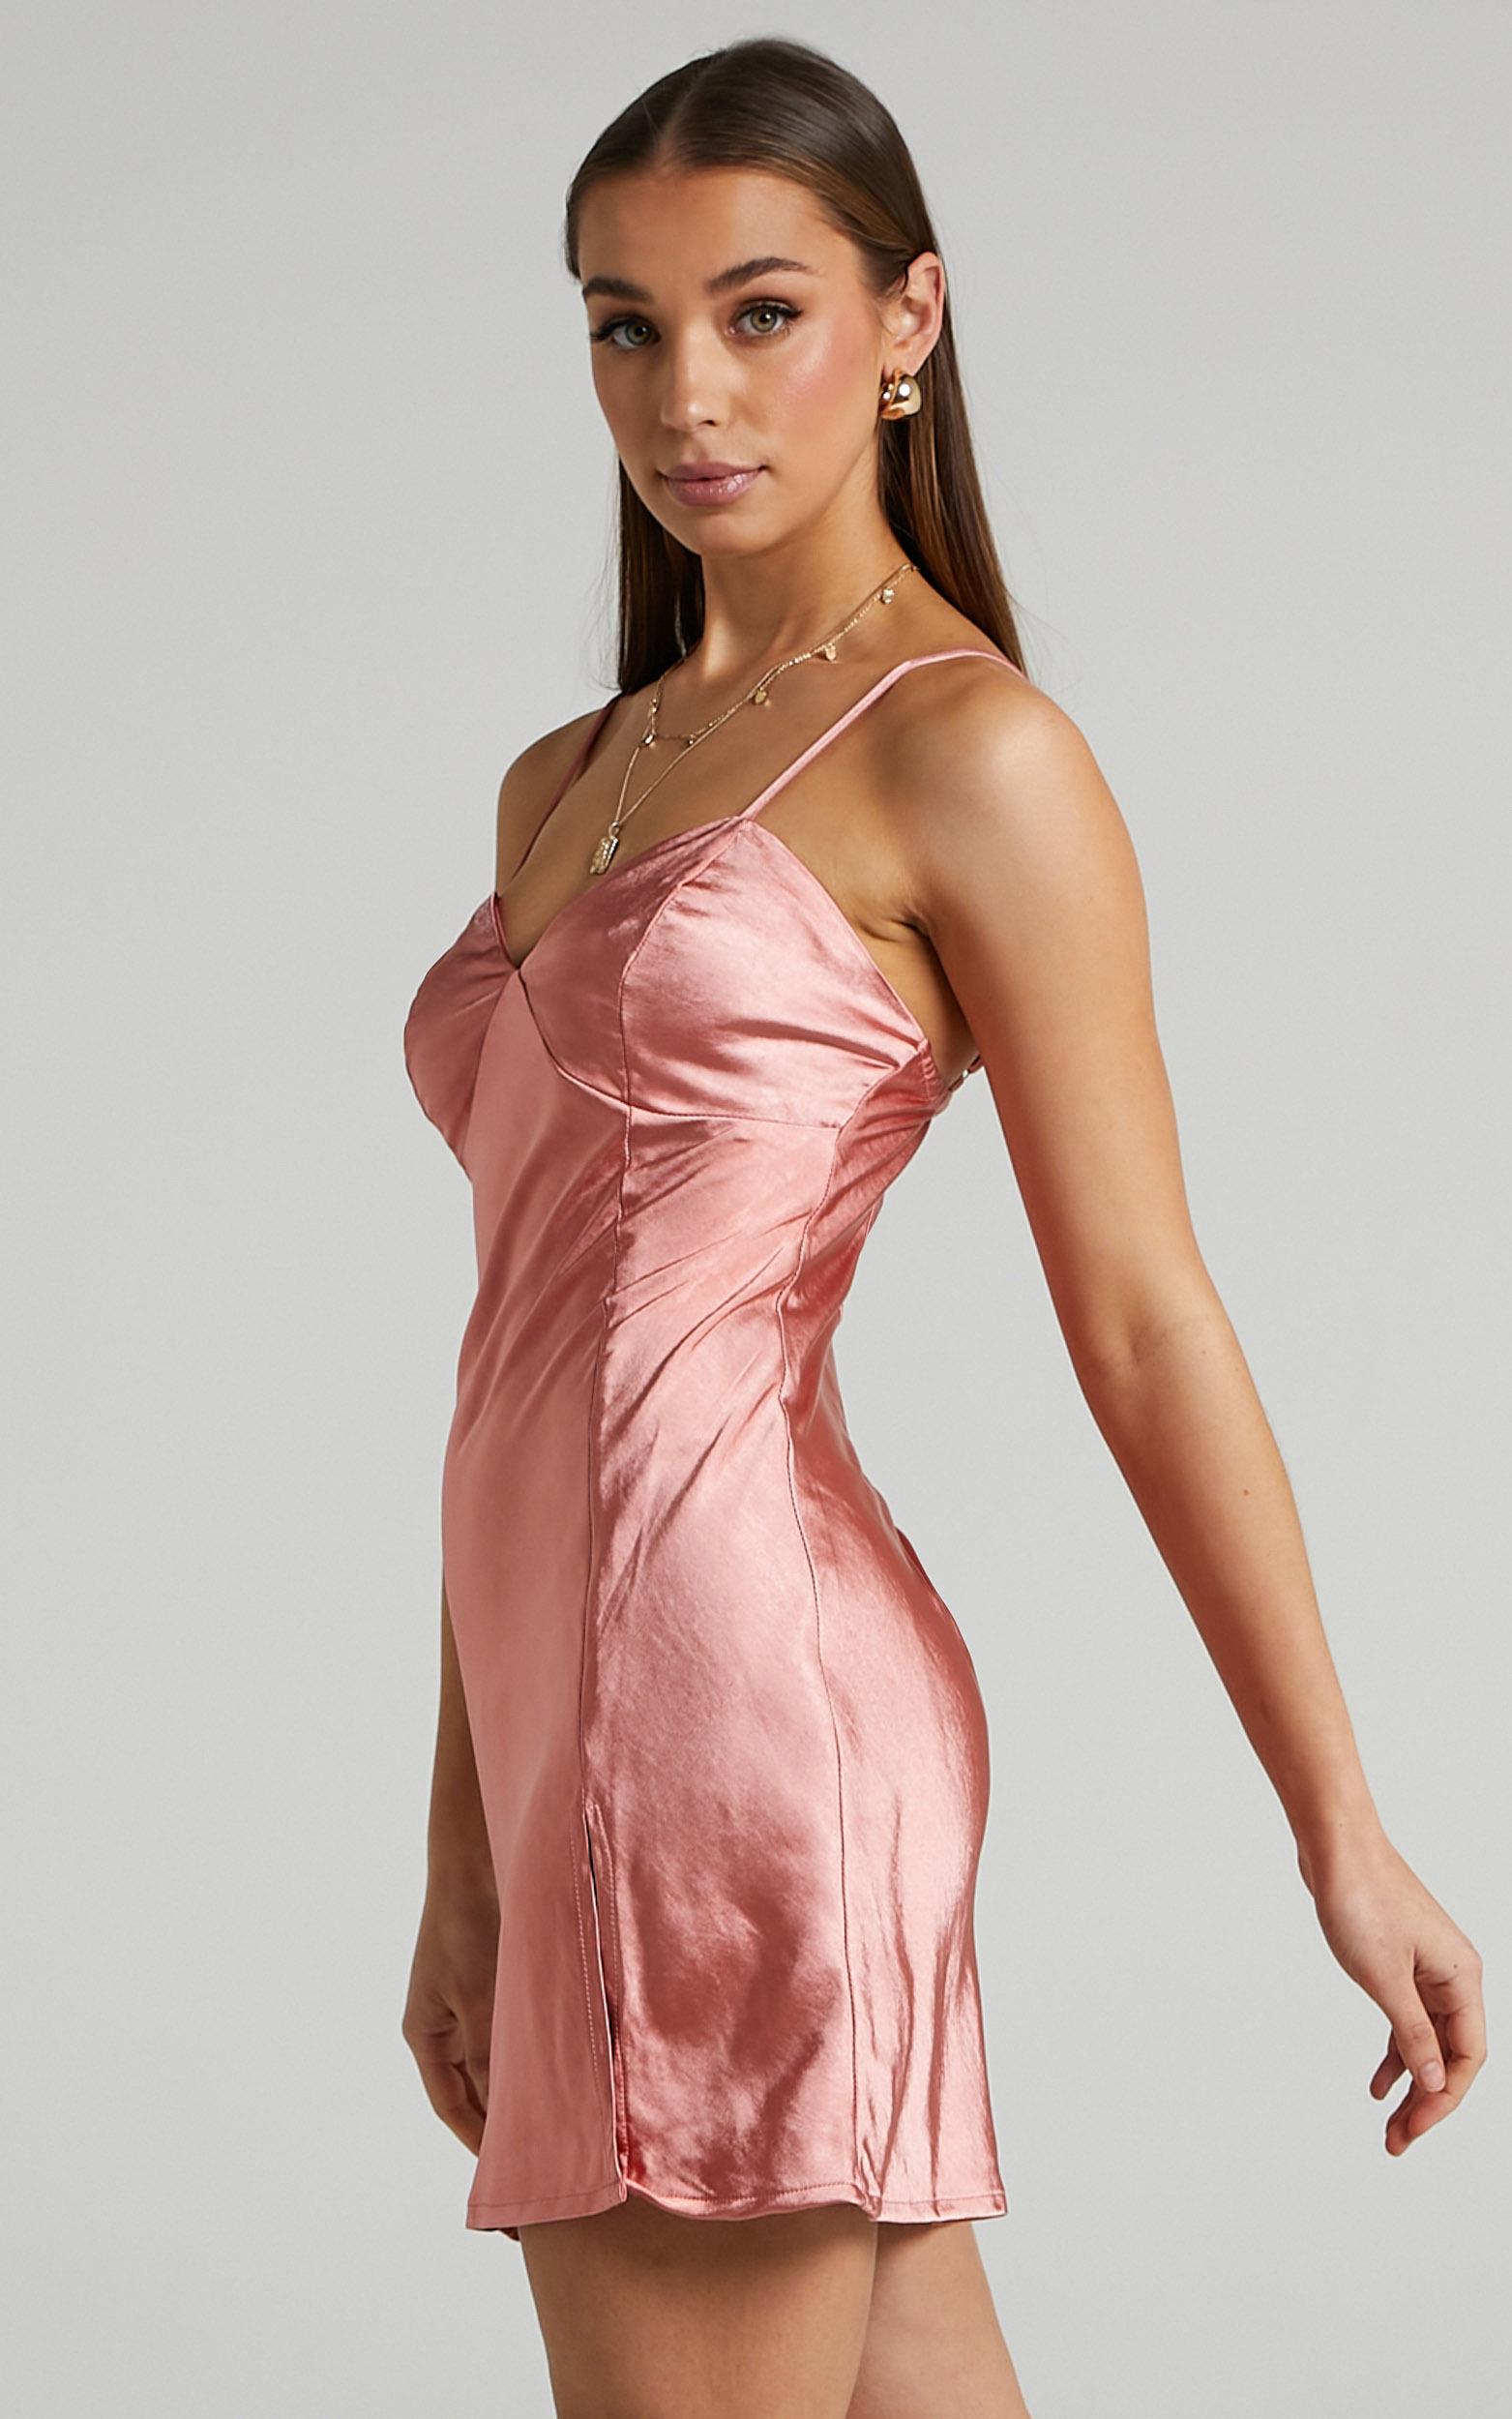 Ollea Mini Satin Slip Dress in Coral - 06, PNK2, hi-res image number null